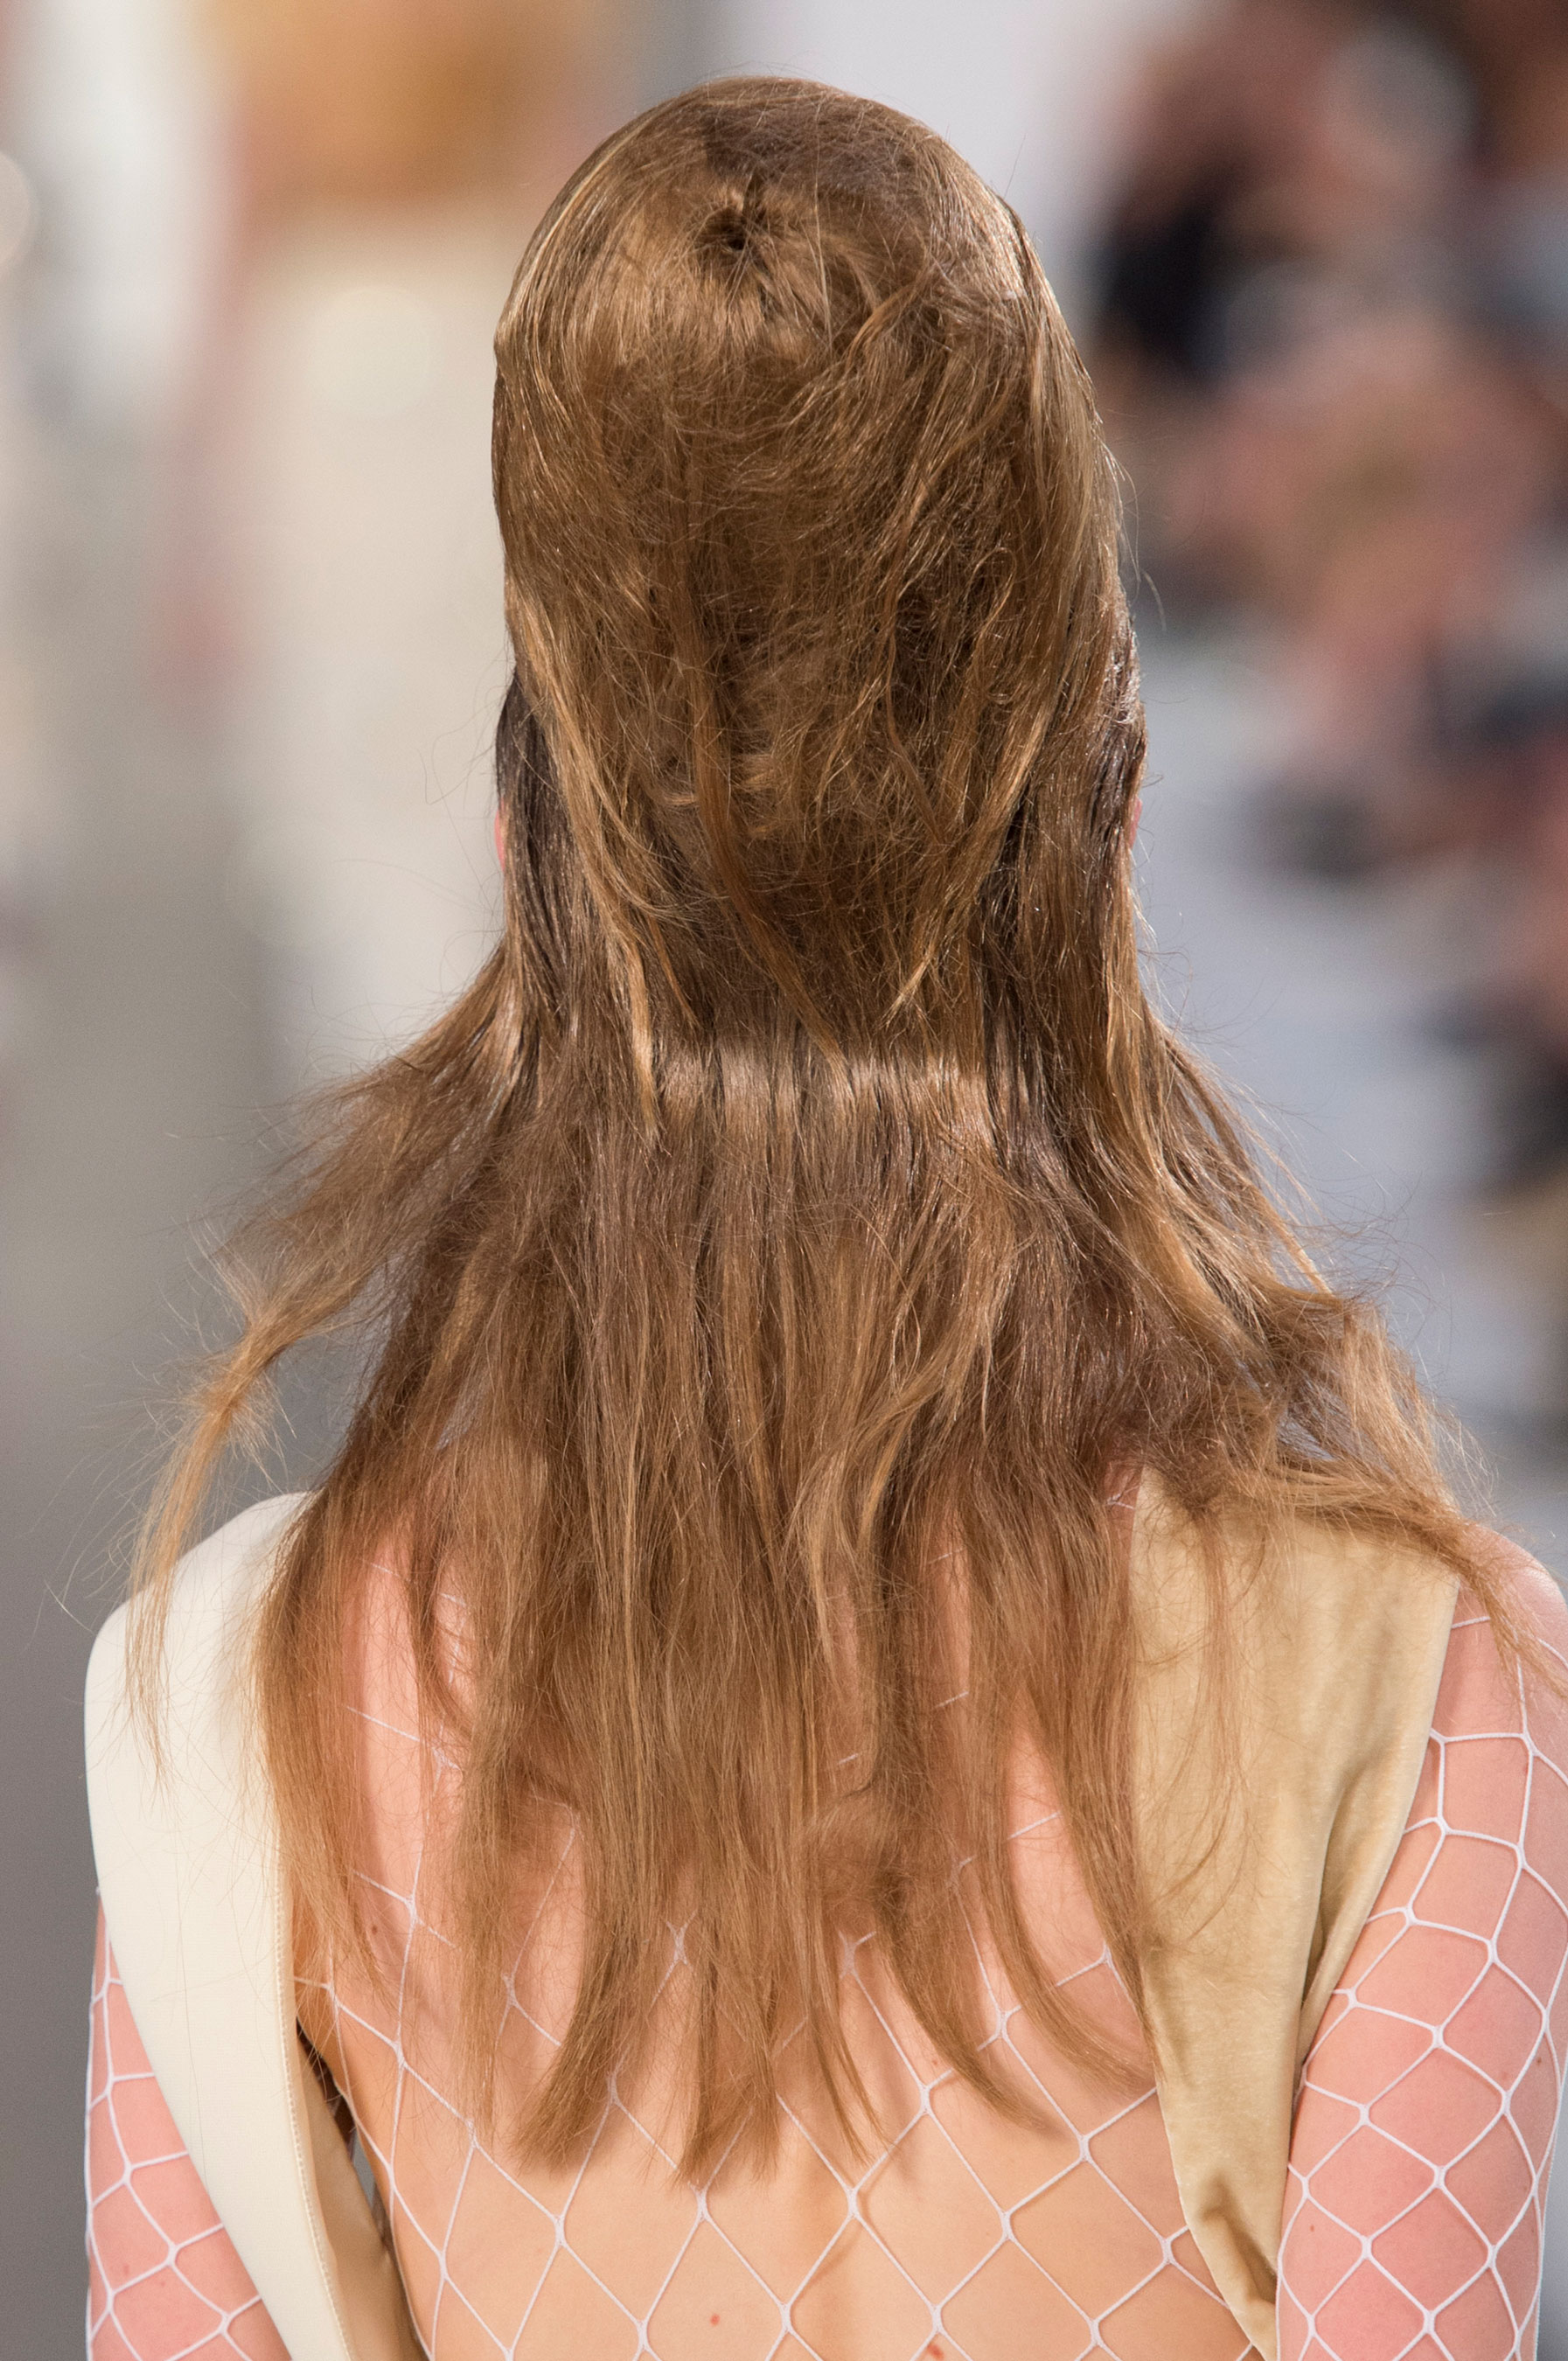 Maison-Margiela-spring-2016-runway-beauty-fashion-show-the-impression-044